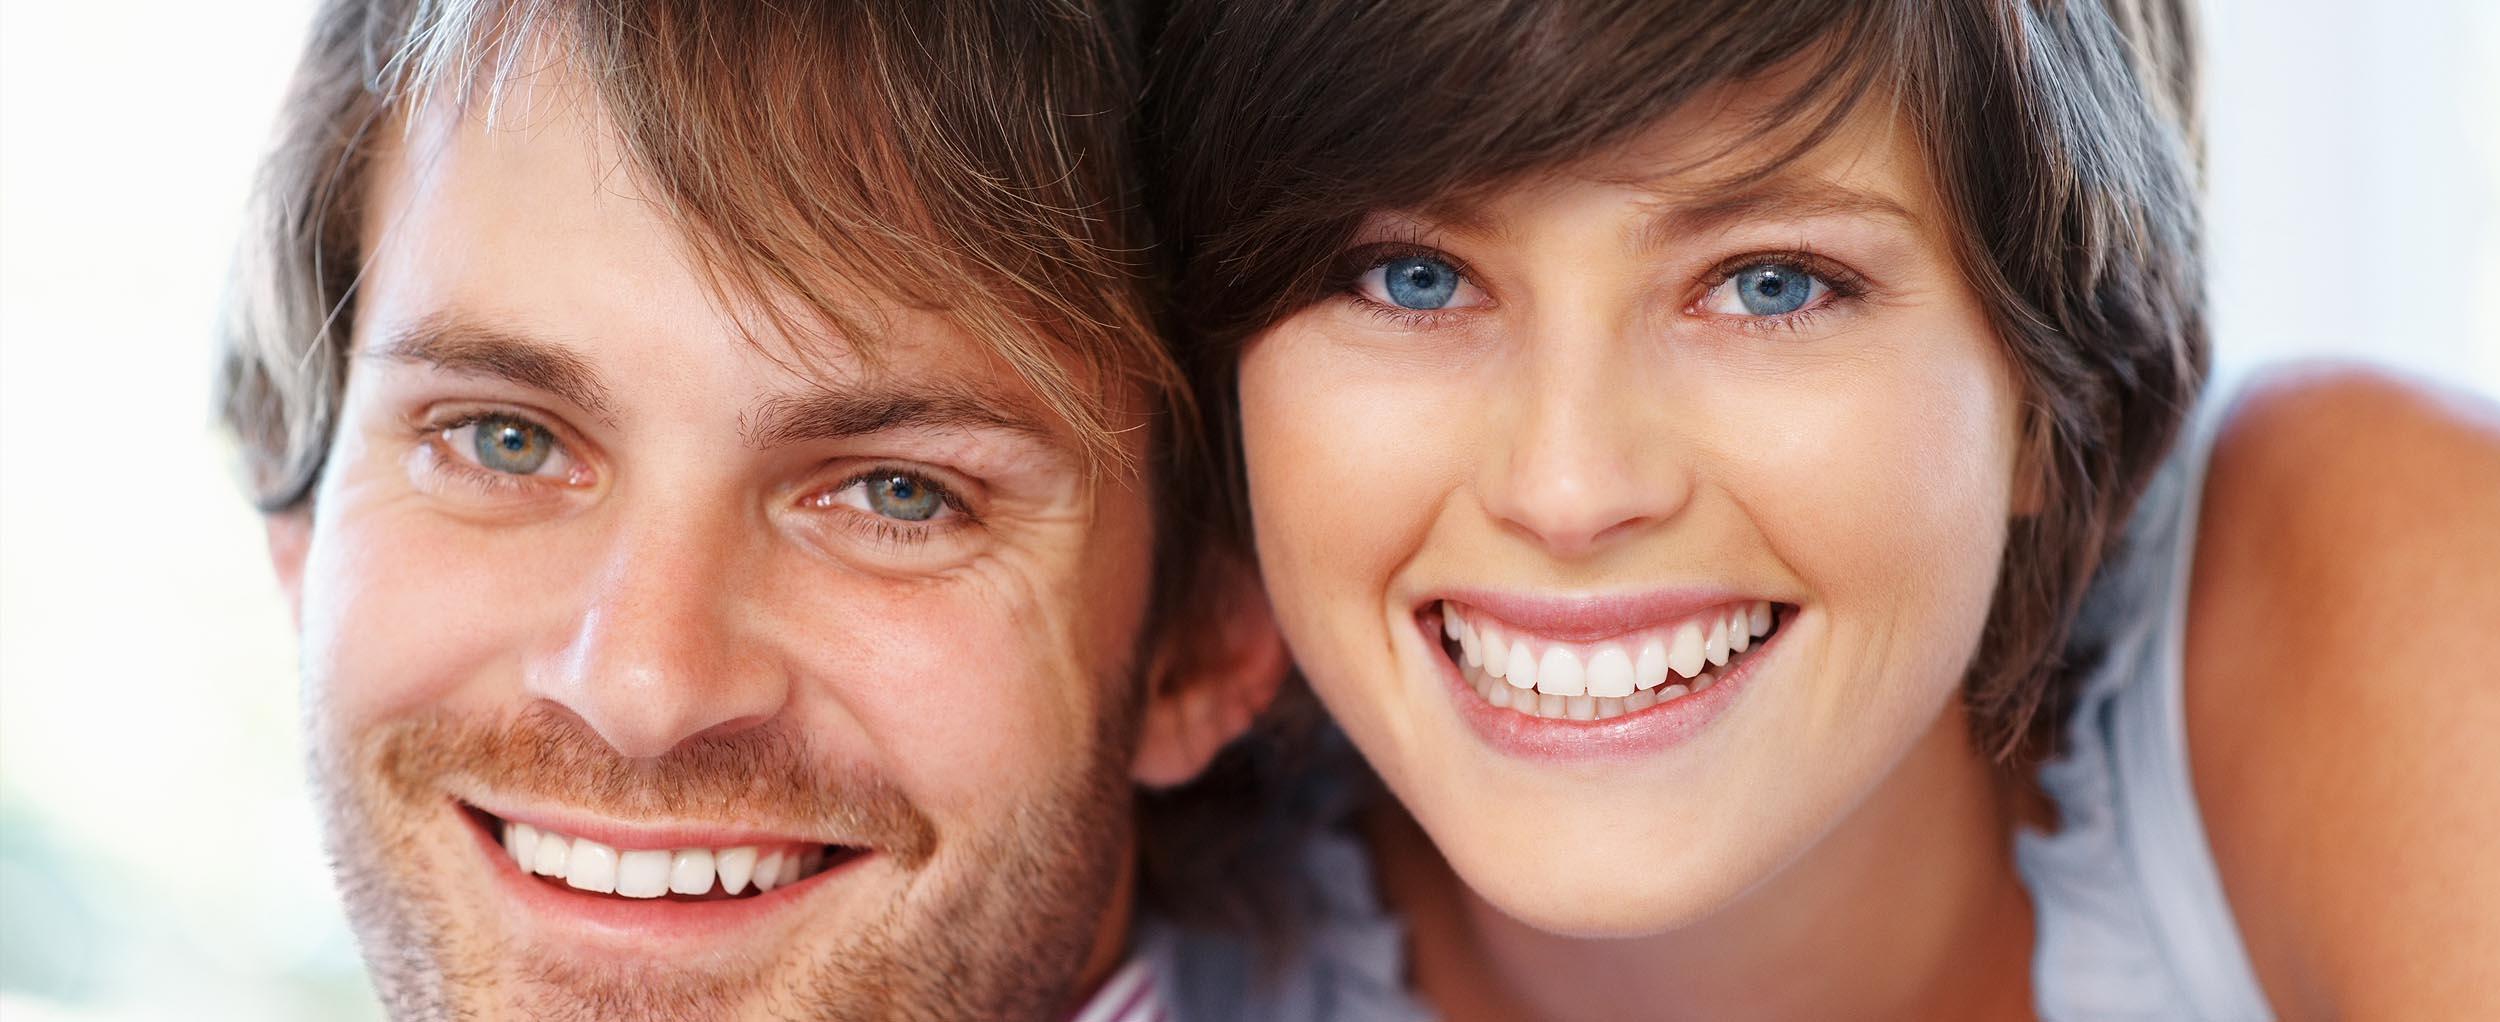 Ritter Ramsey Teeth Whitening Banner Image